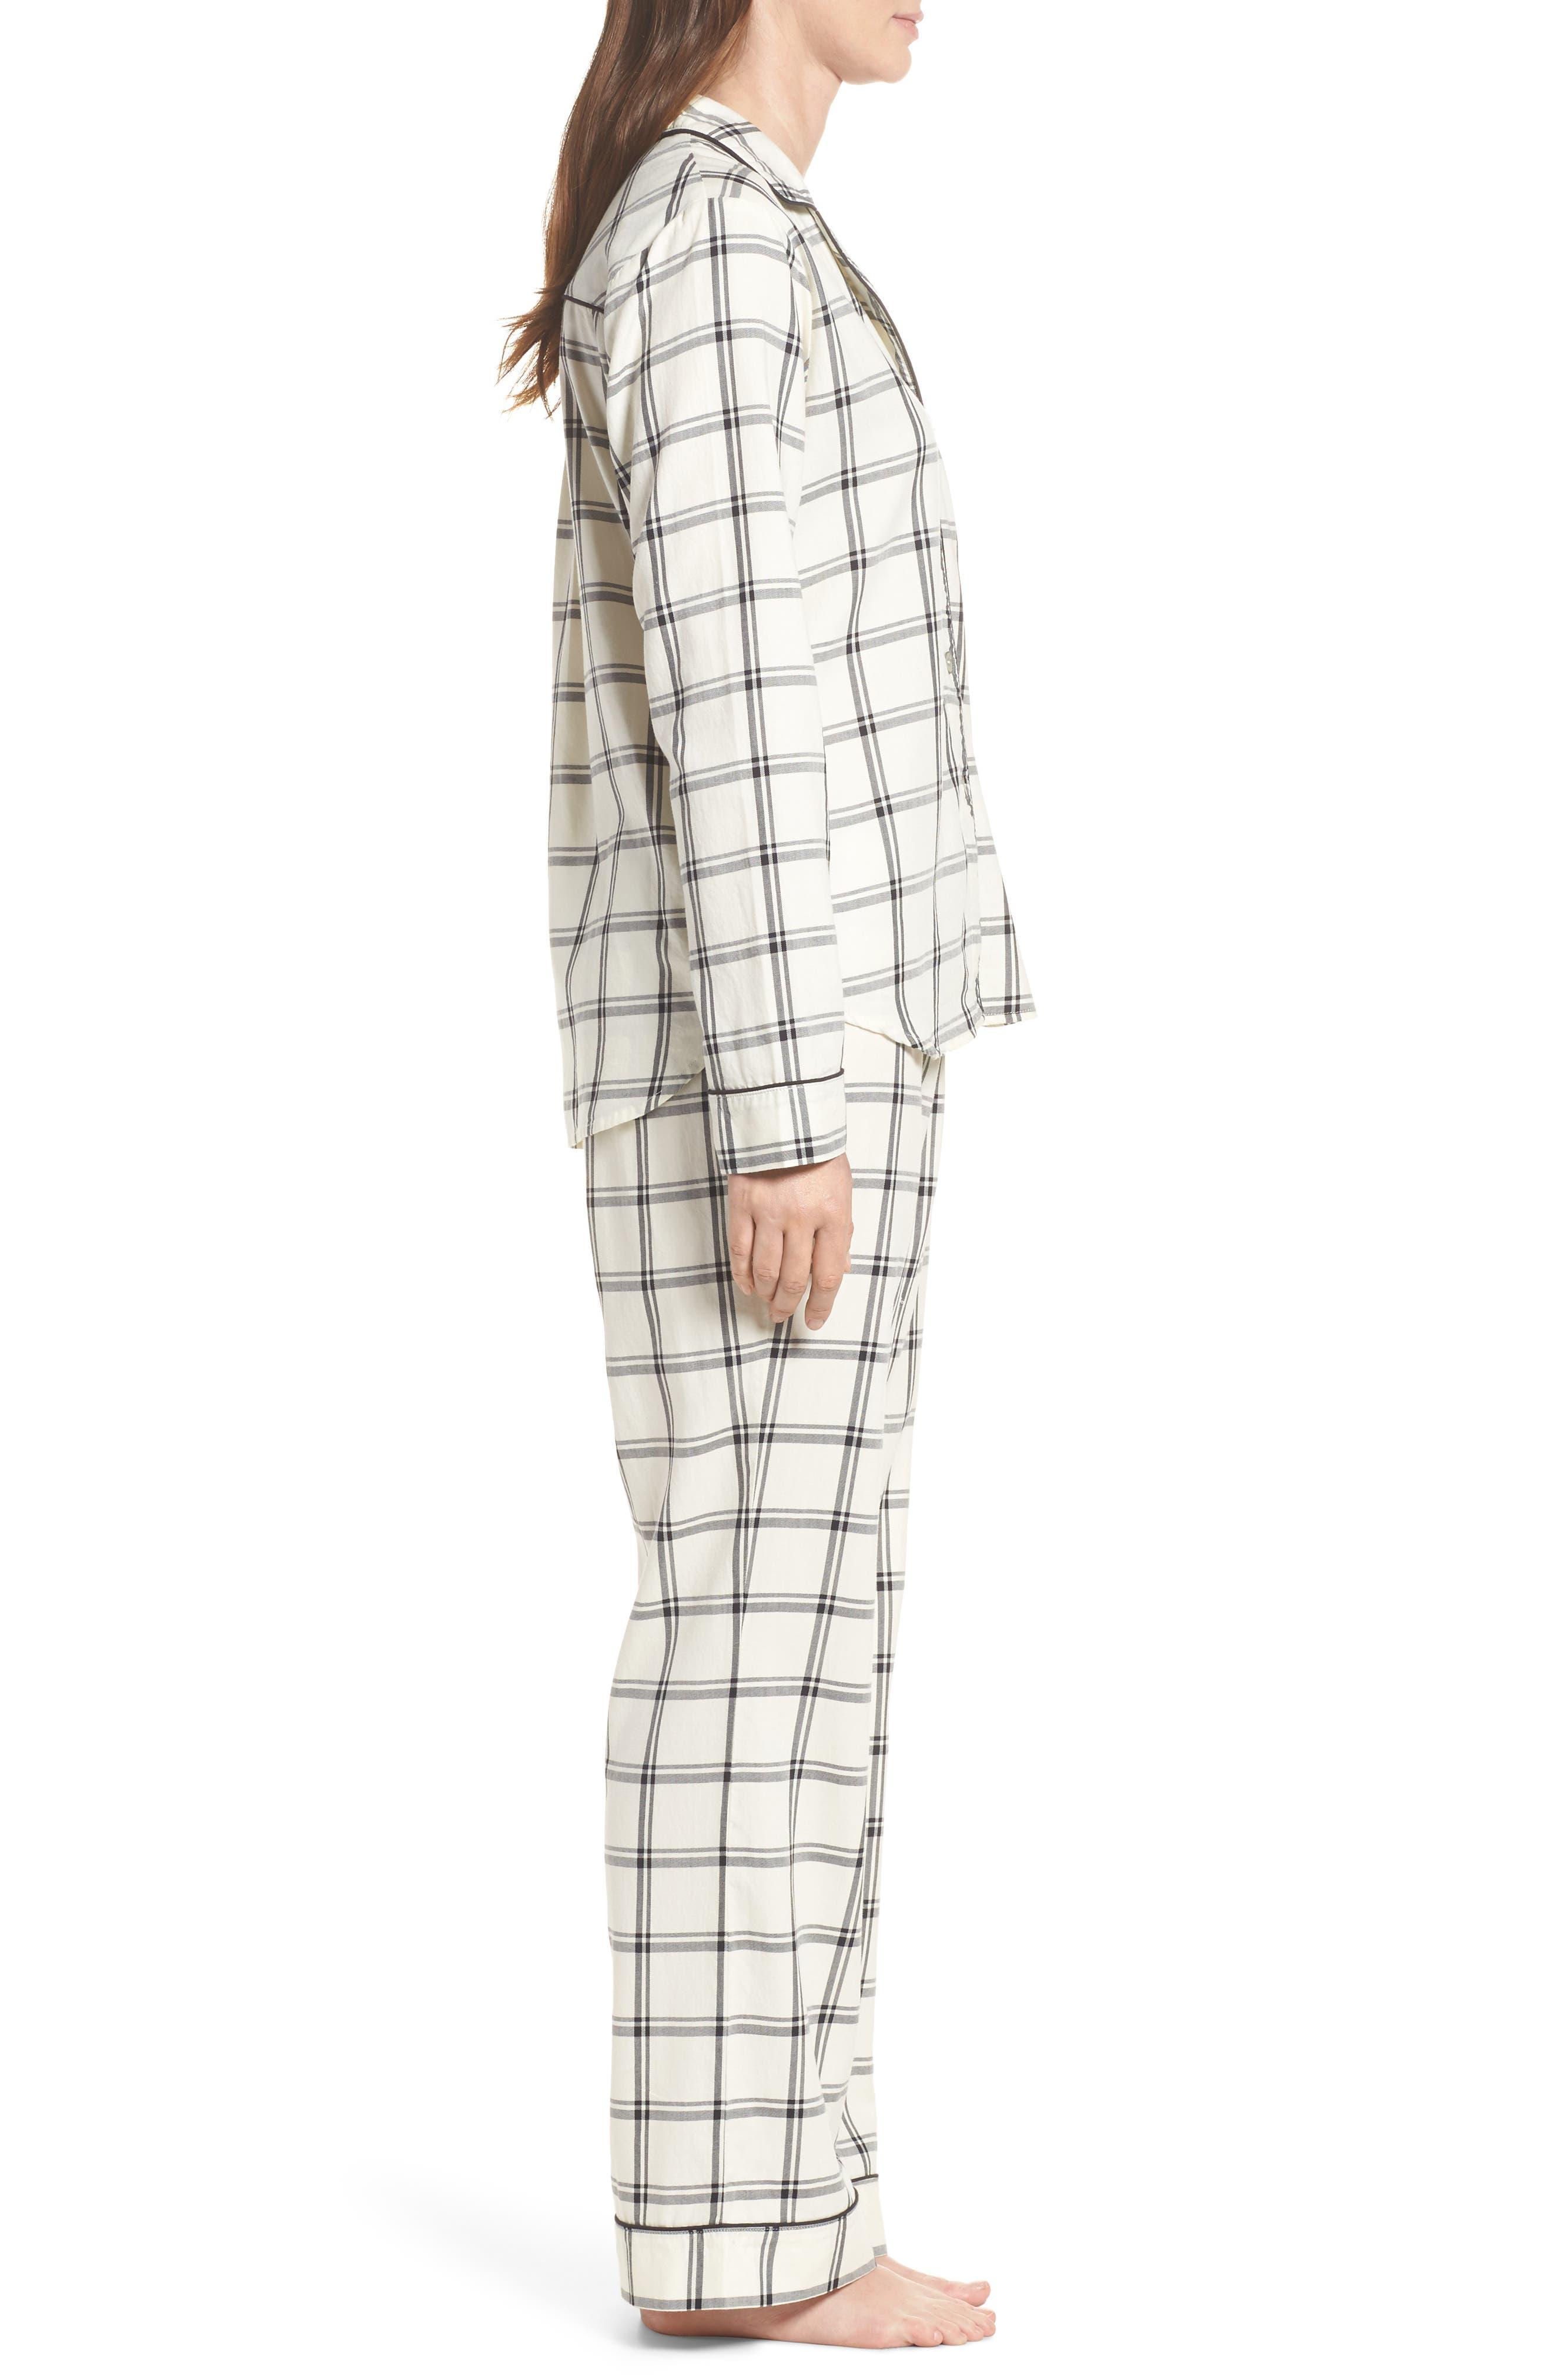 Raven Plaid Pajamas,                             Alternate thumbnail 3, color,                             Cream/ Black